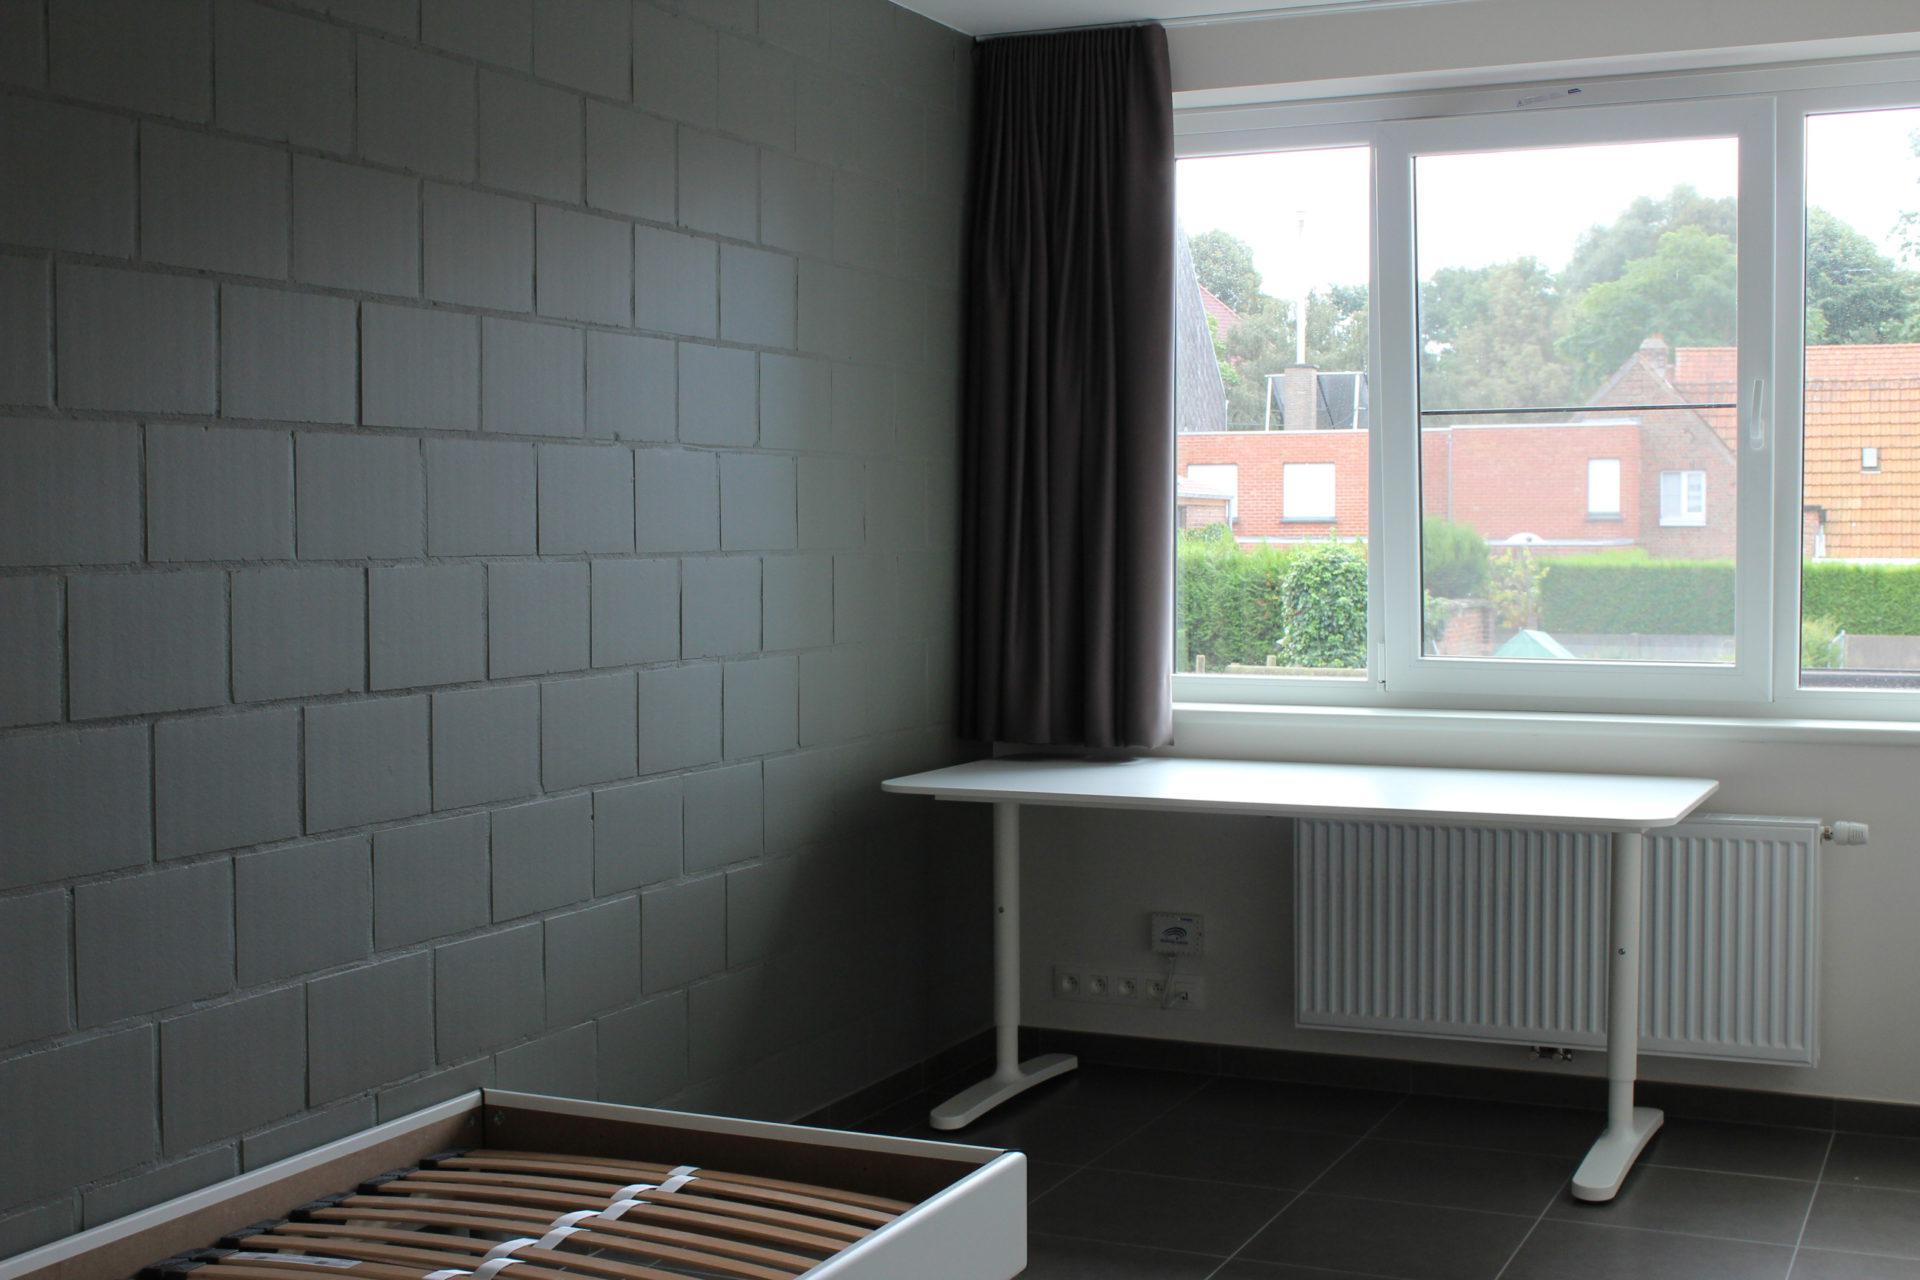 Studentenkamer u20ac 260 maand 16 m² roeselare kot 8800